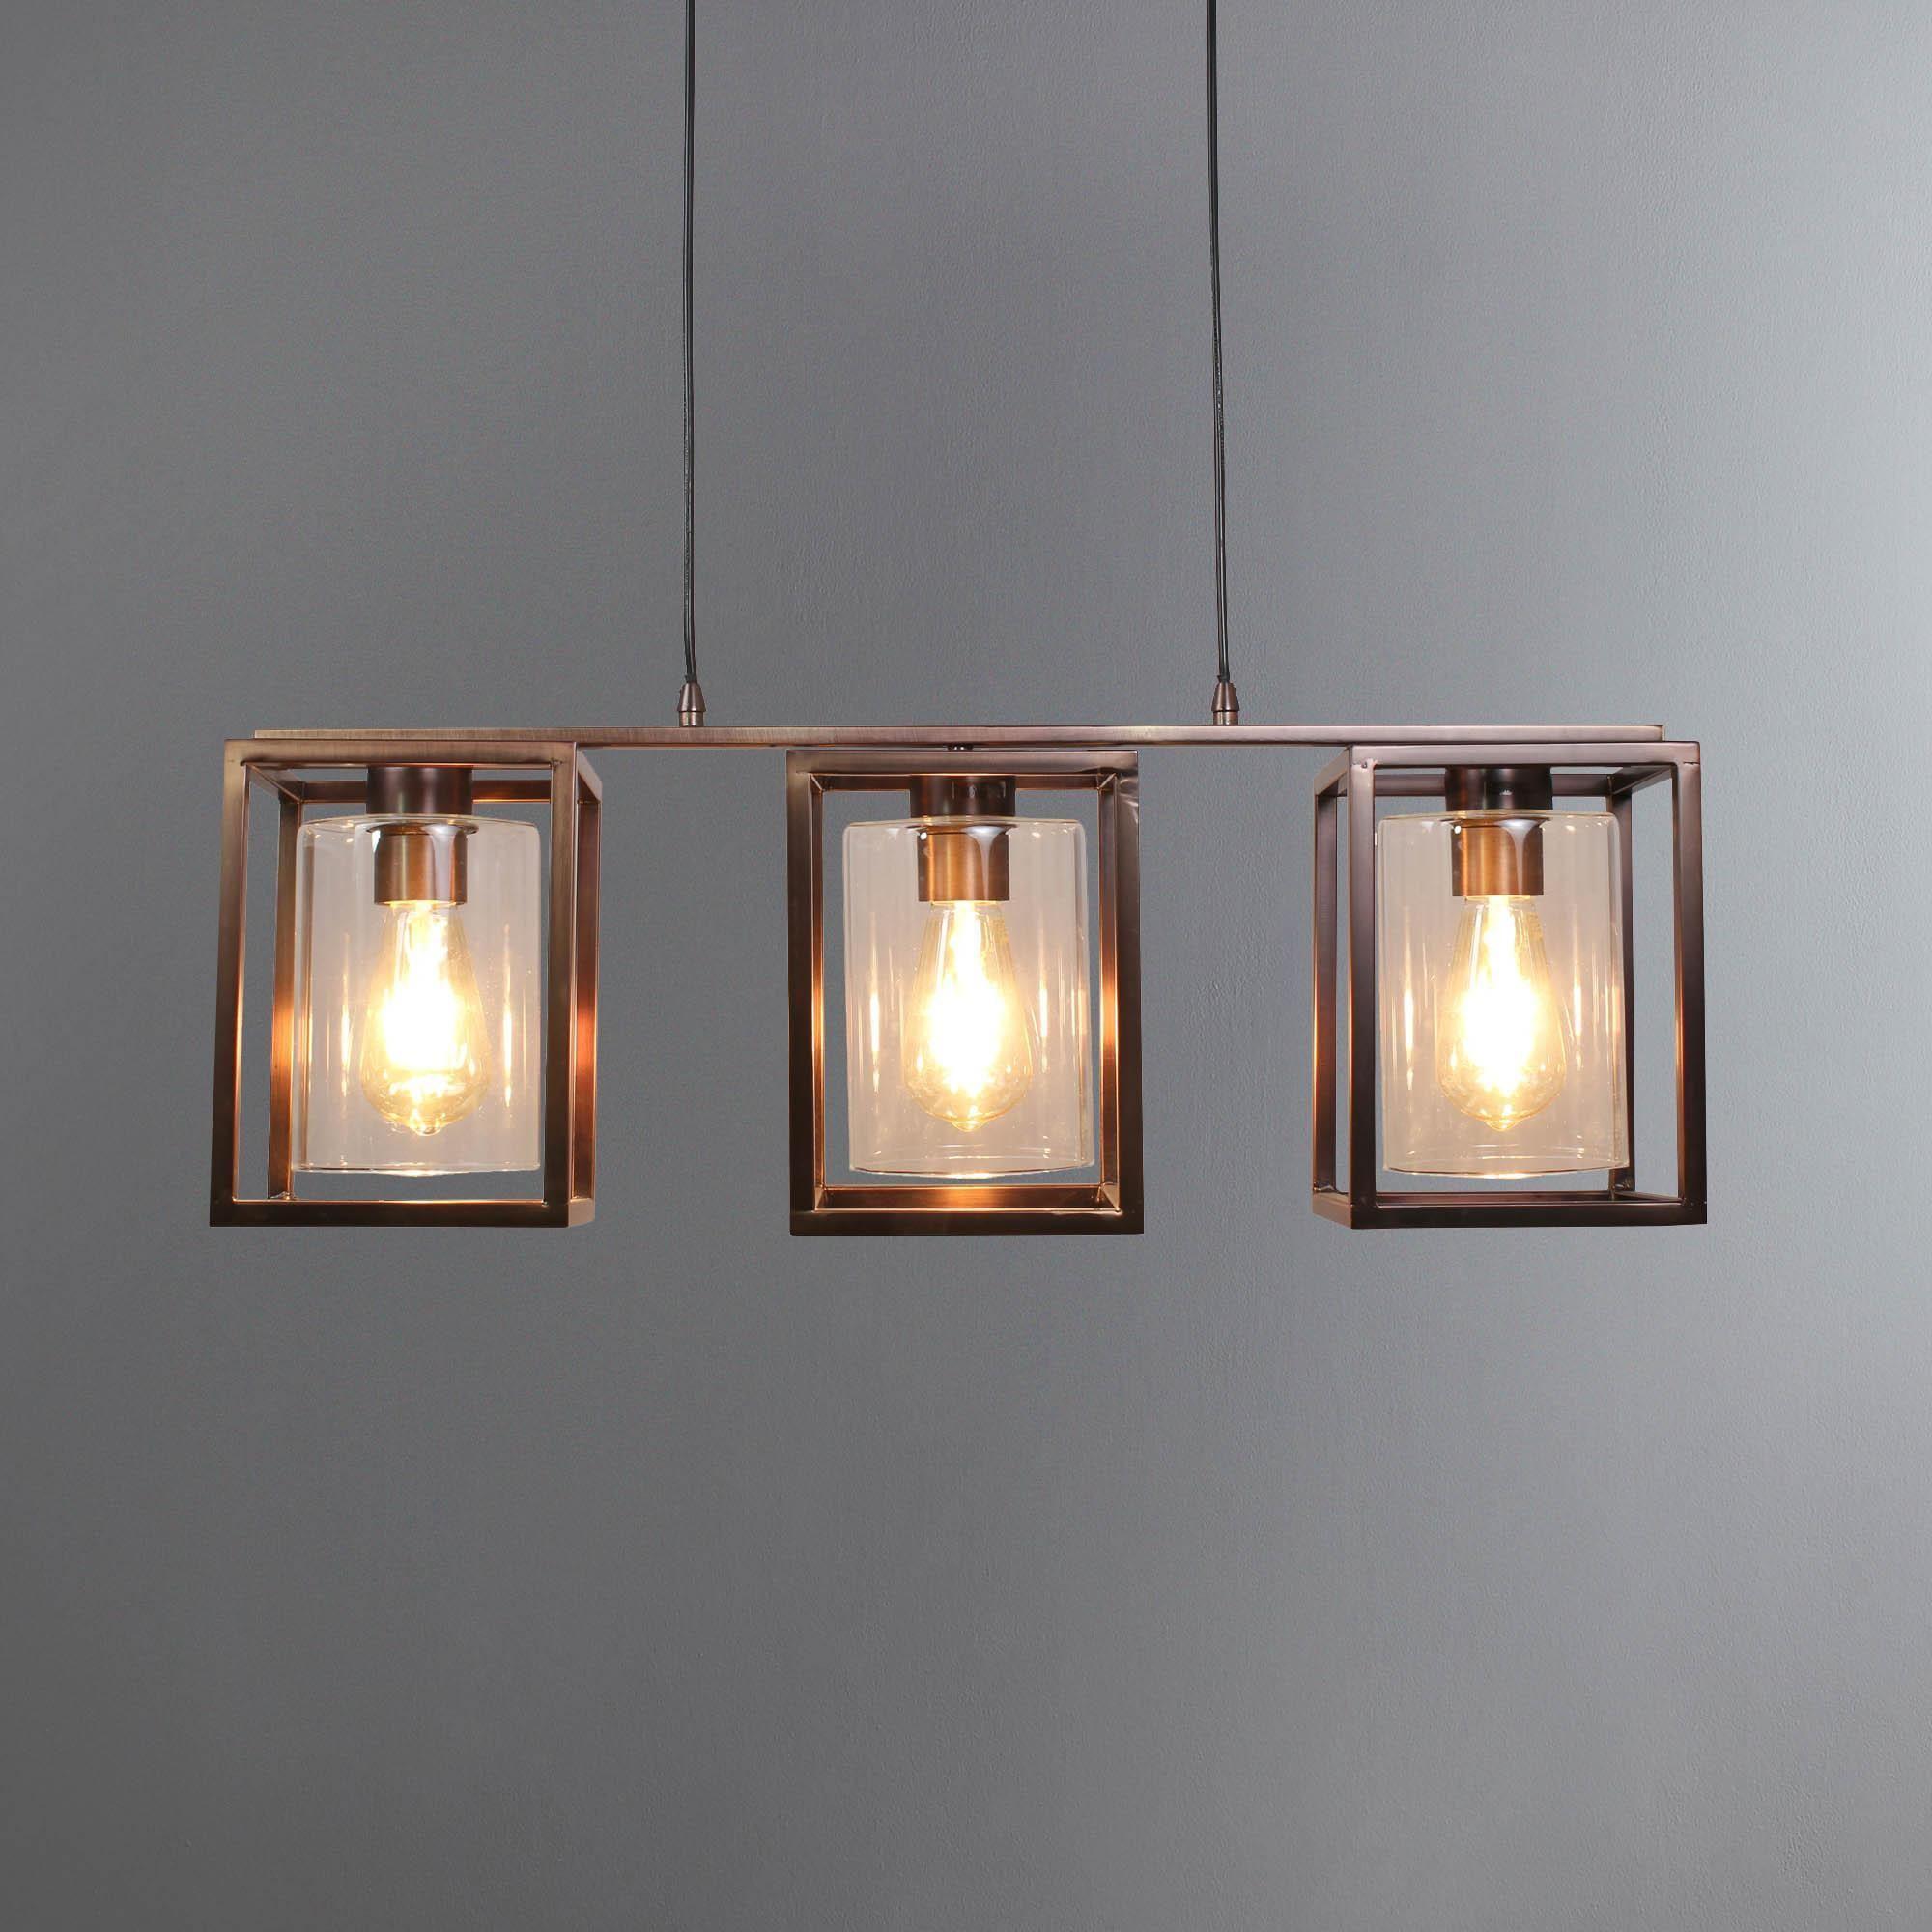 ceiling bathroom lighting mid century london bronze light fitting rh pinterest com